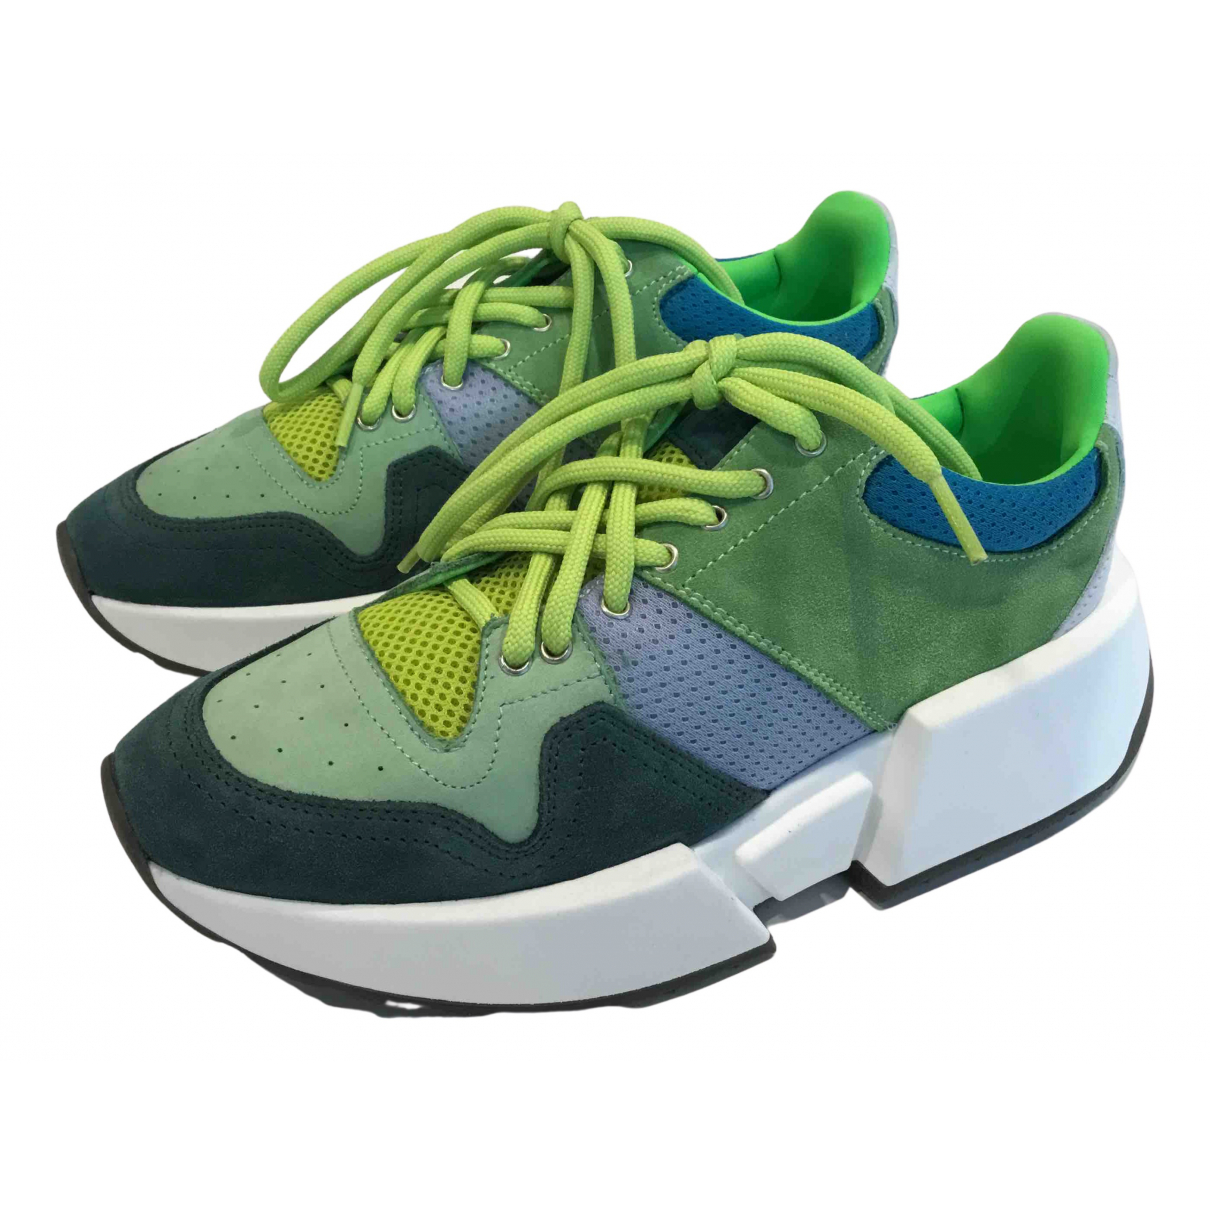 Mm6 N Green Trainers for Women 40 EU